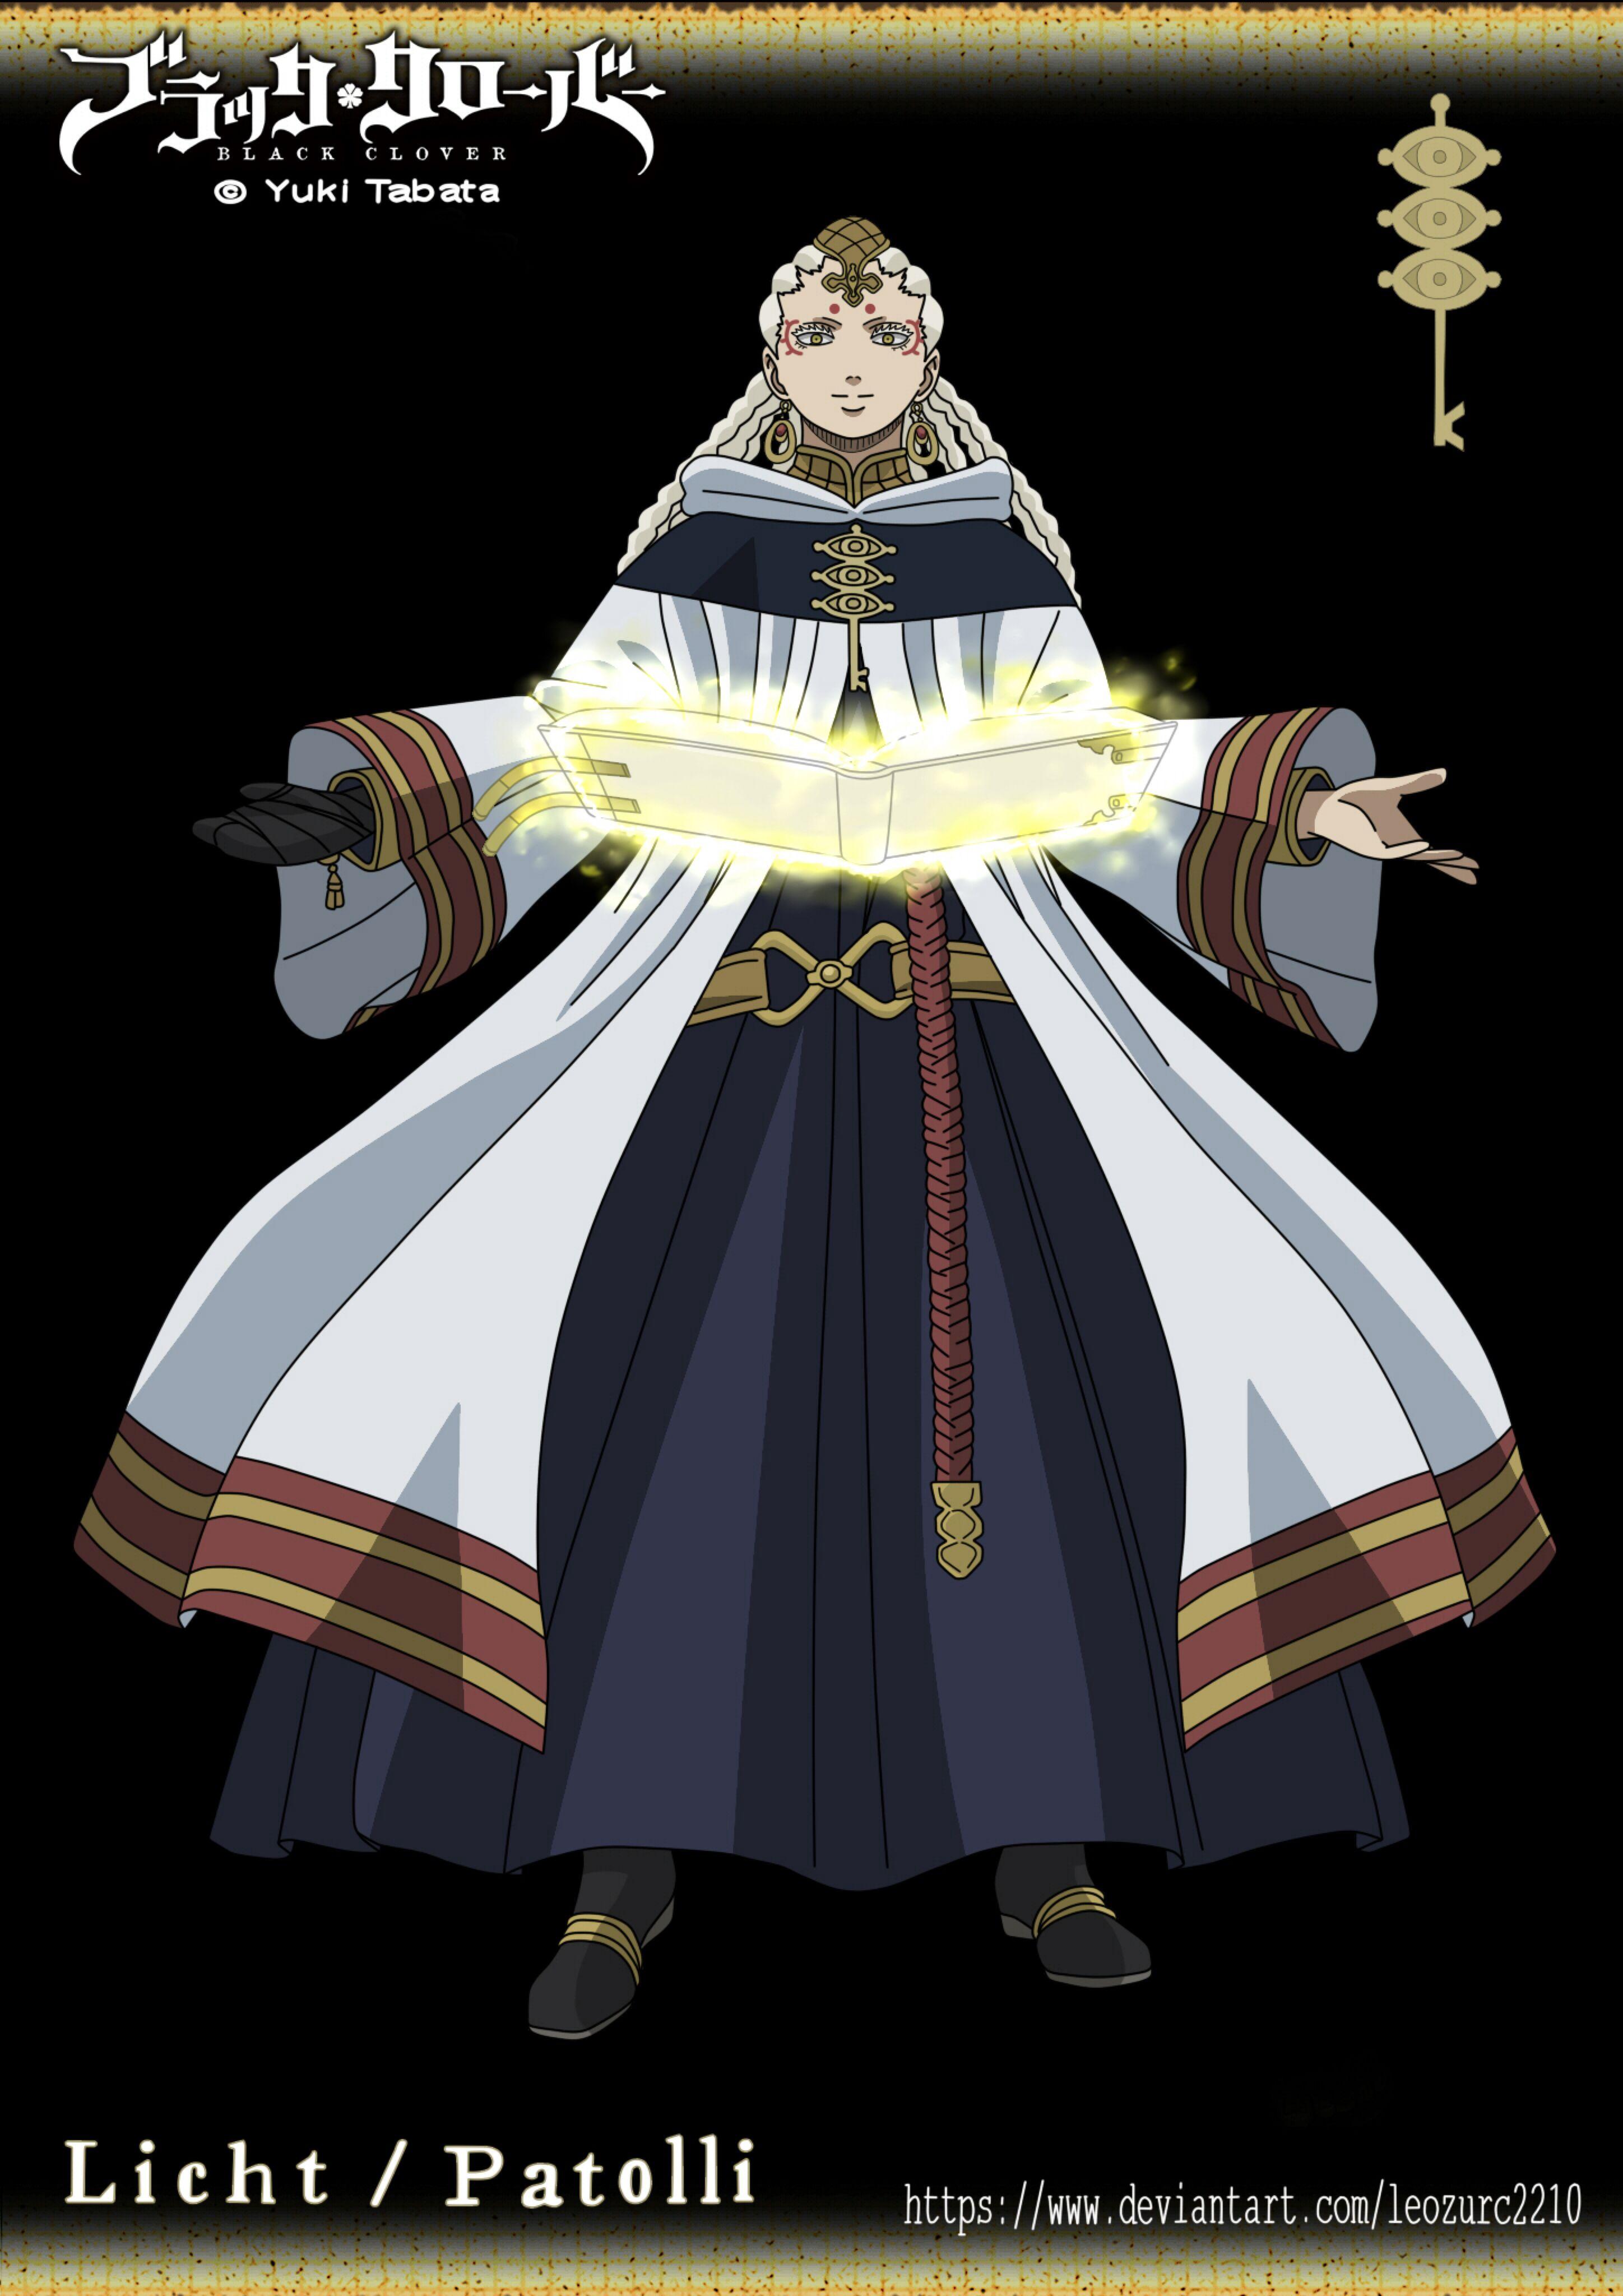 Patolli By Leozurc2210 On Deviantart Black Clover Anime Black Bull Dark Fantasy Art